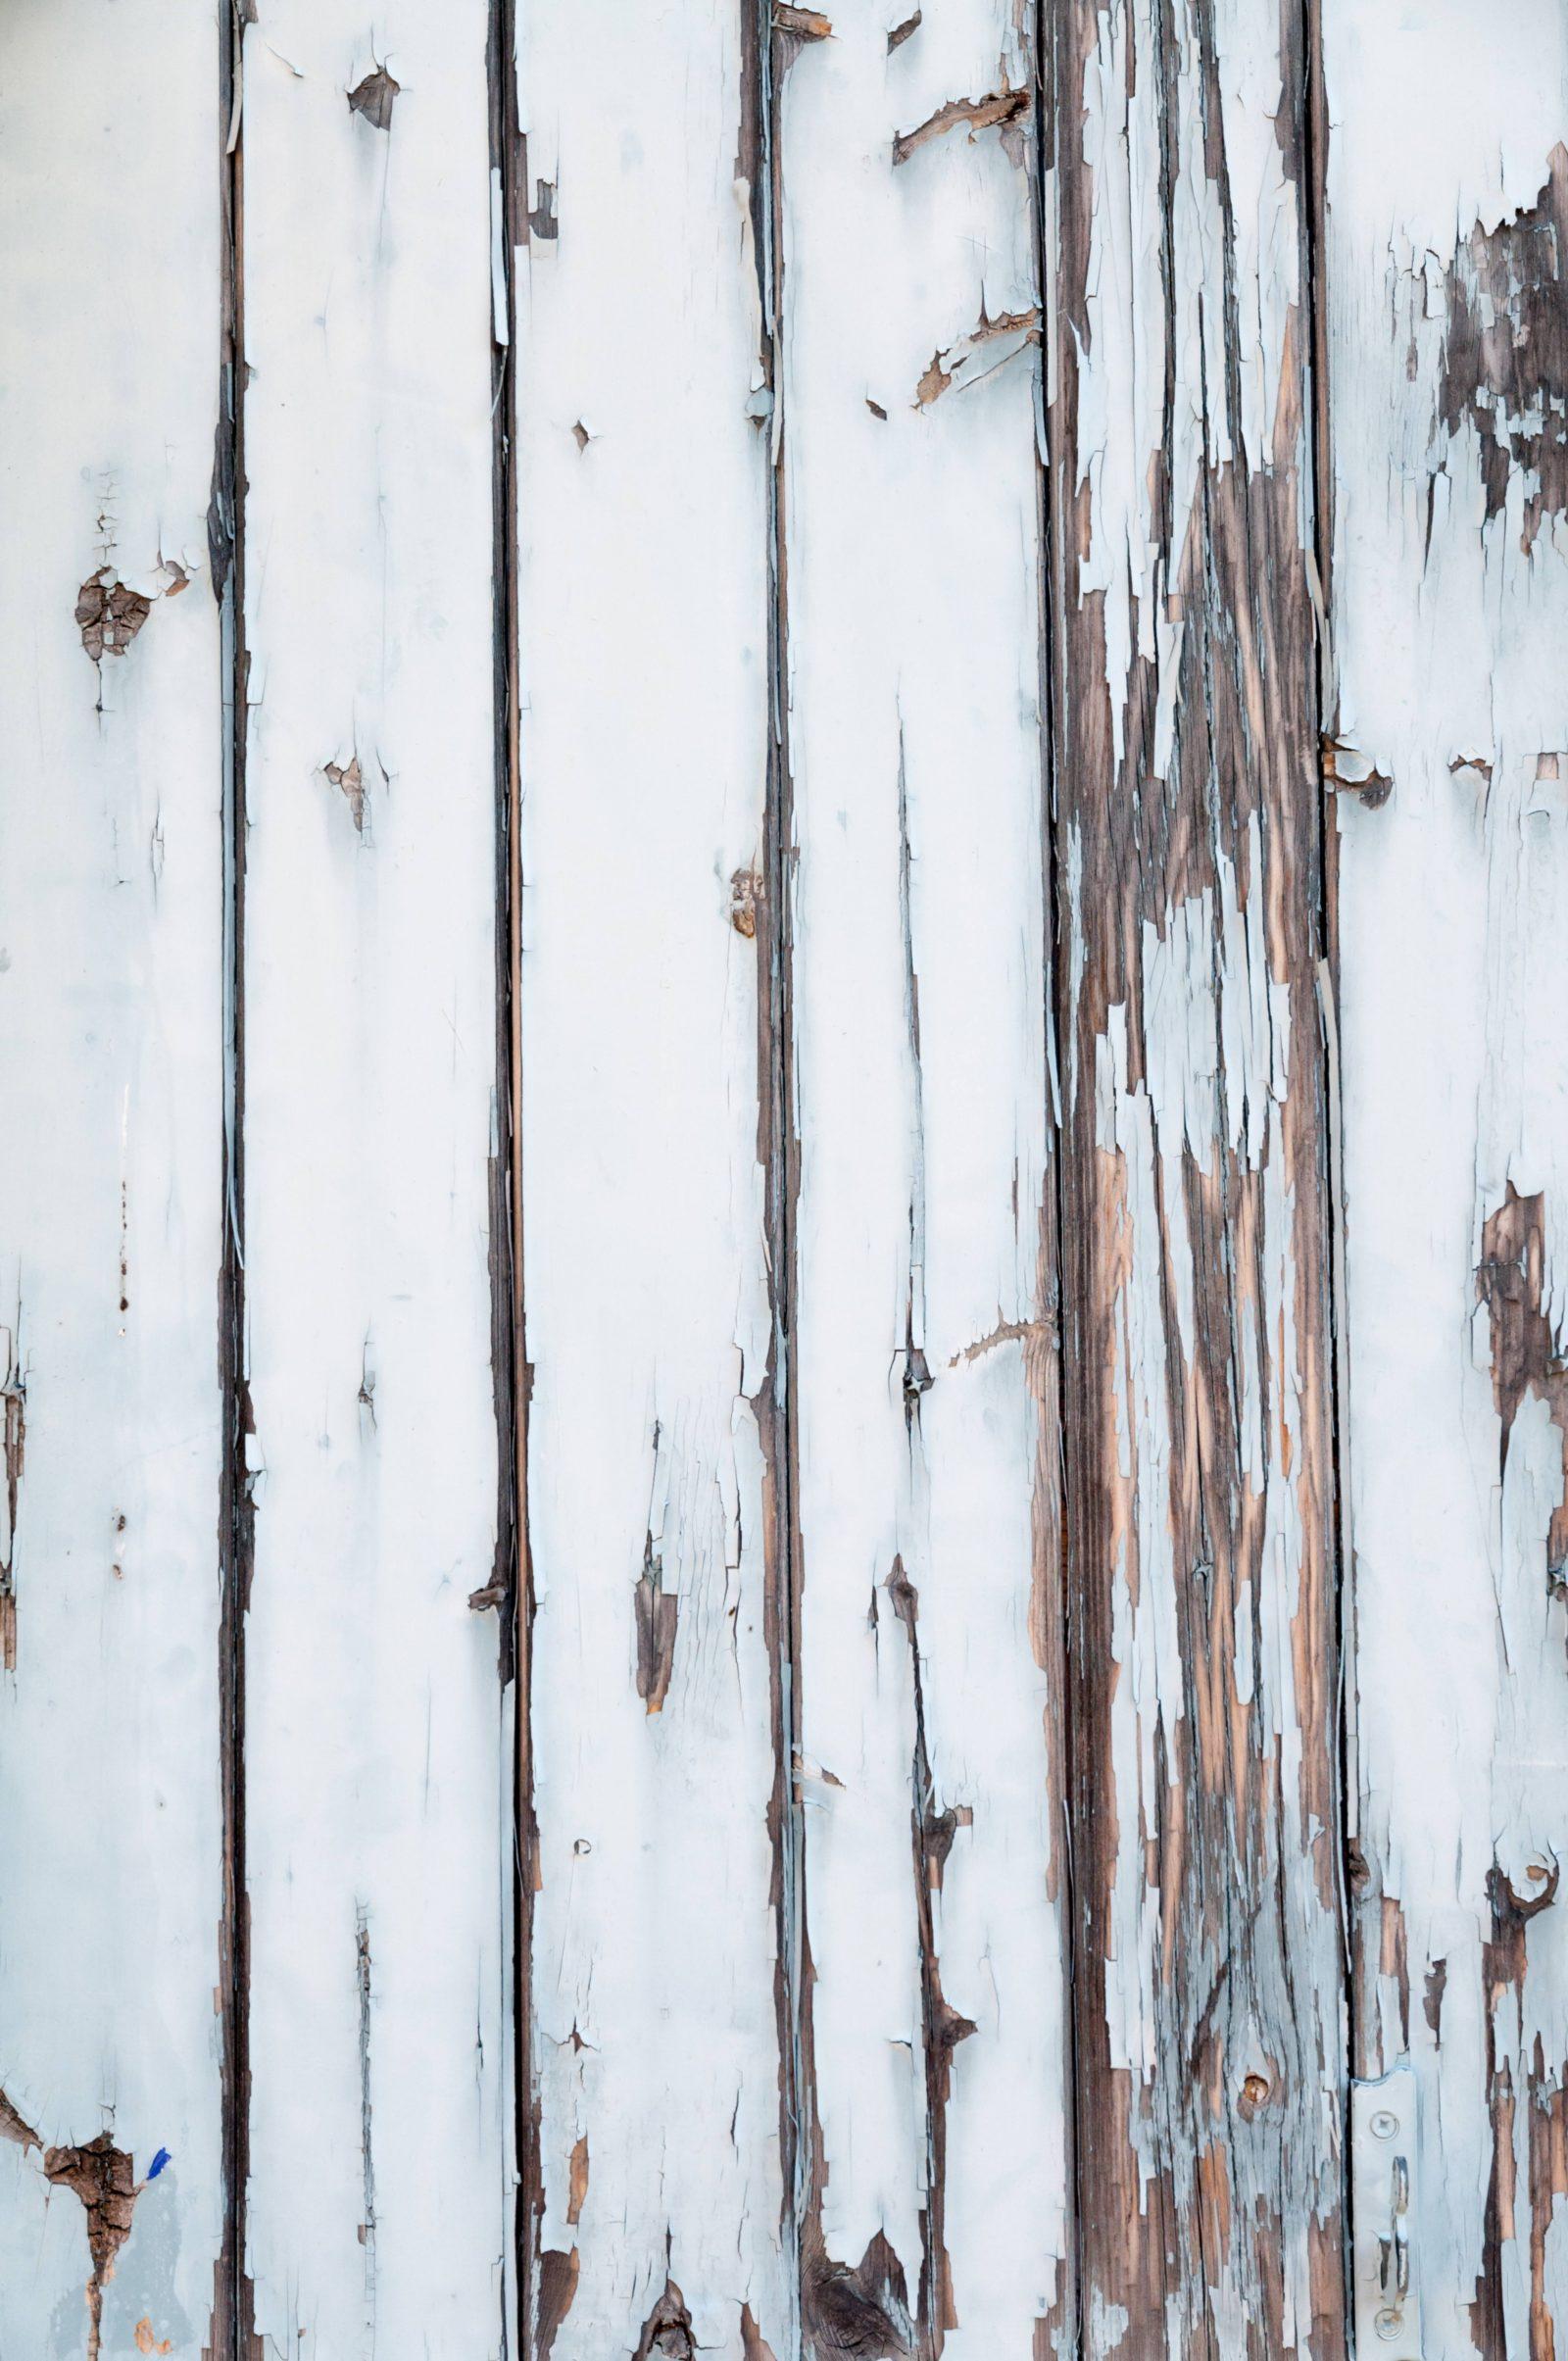 Old white wood planks